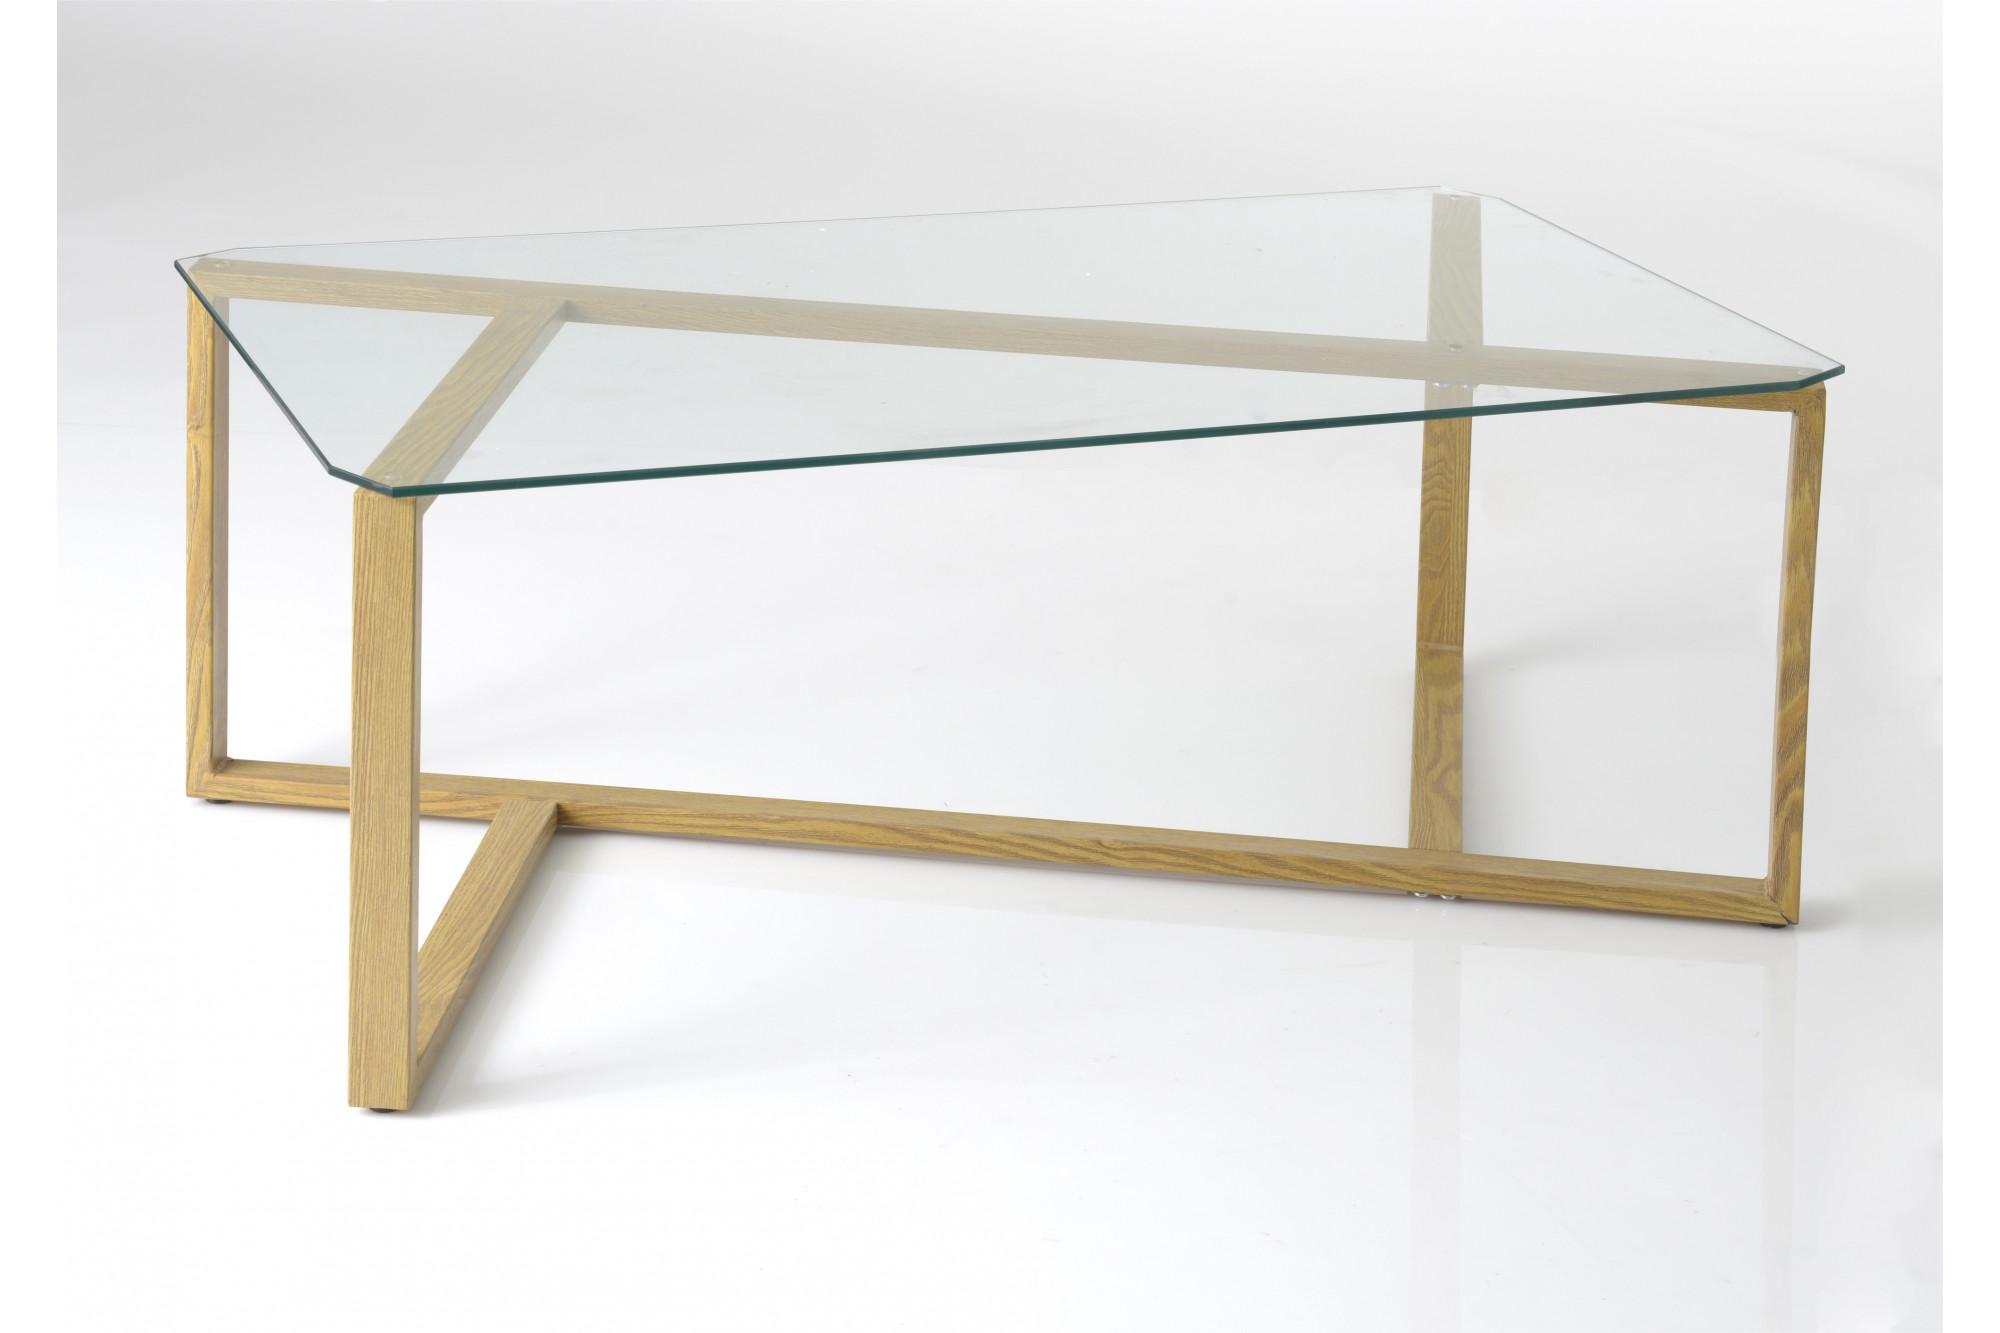 Table Basse Imitation Bois Et Verre Hellin